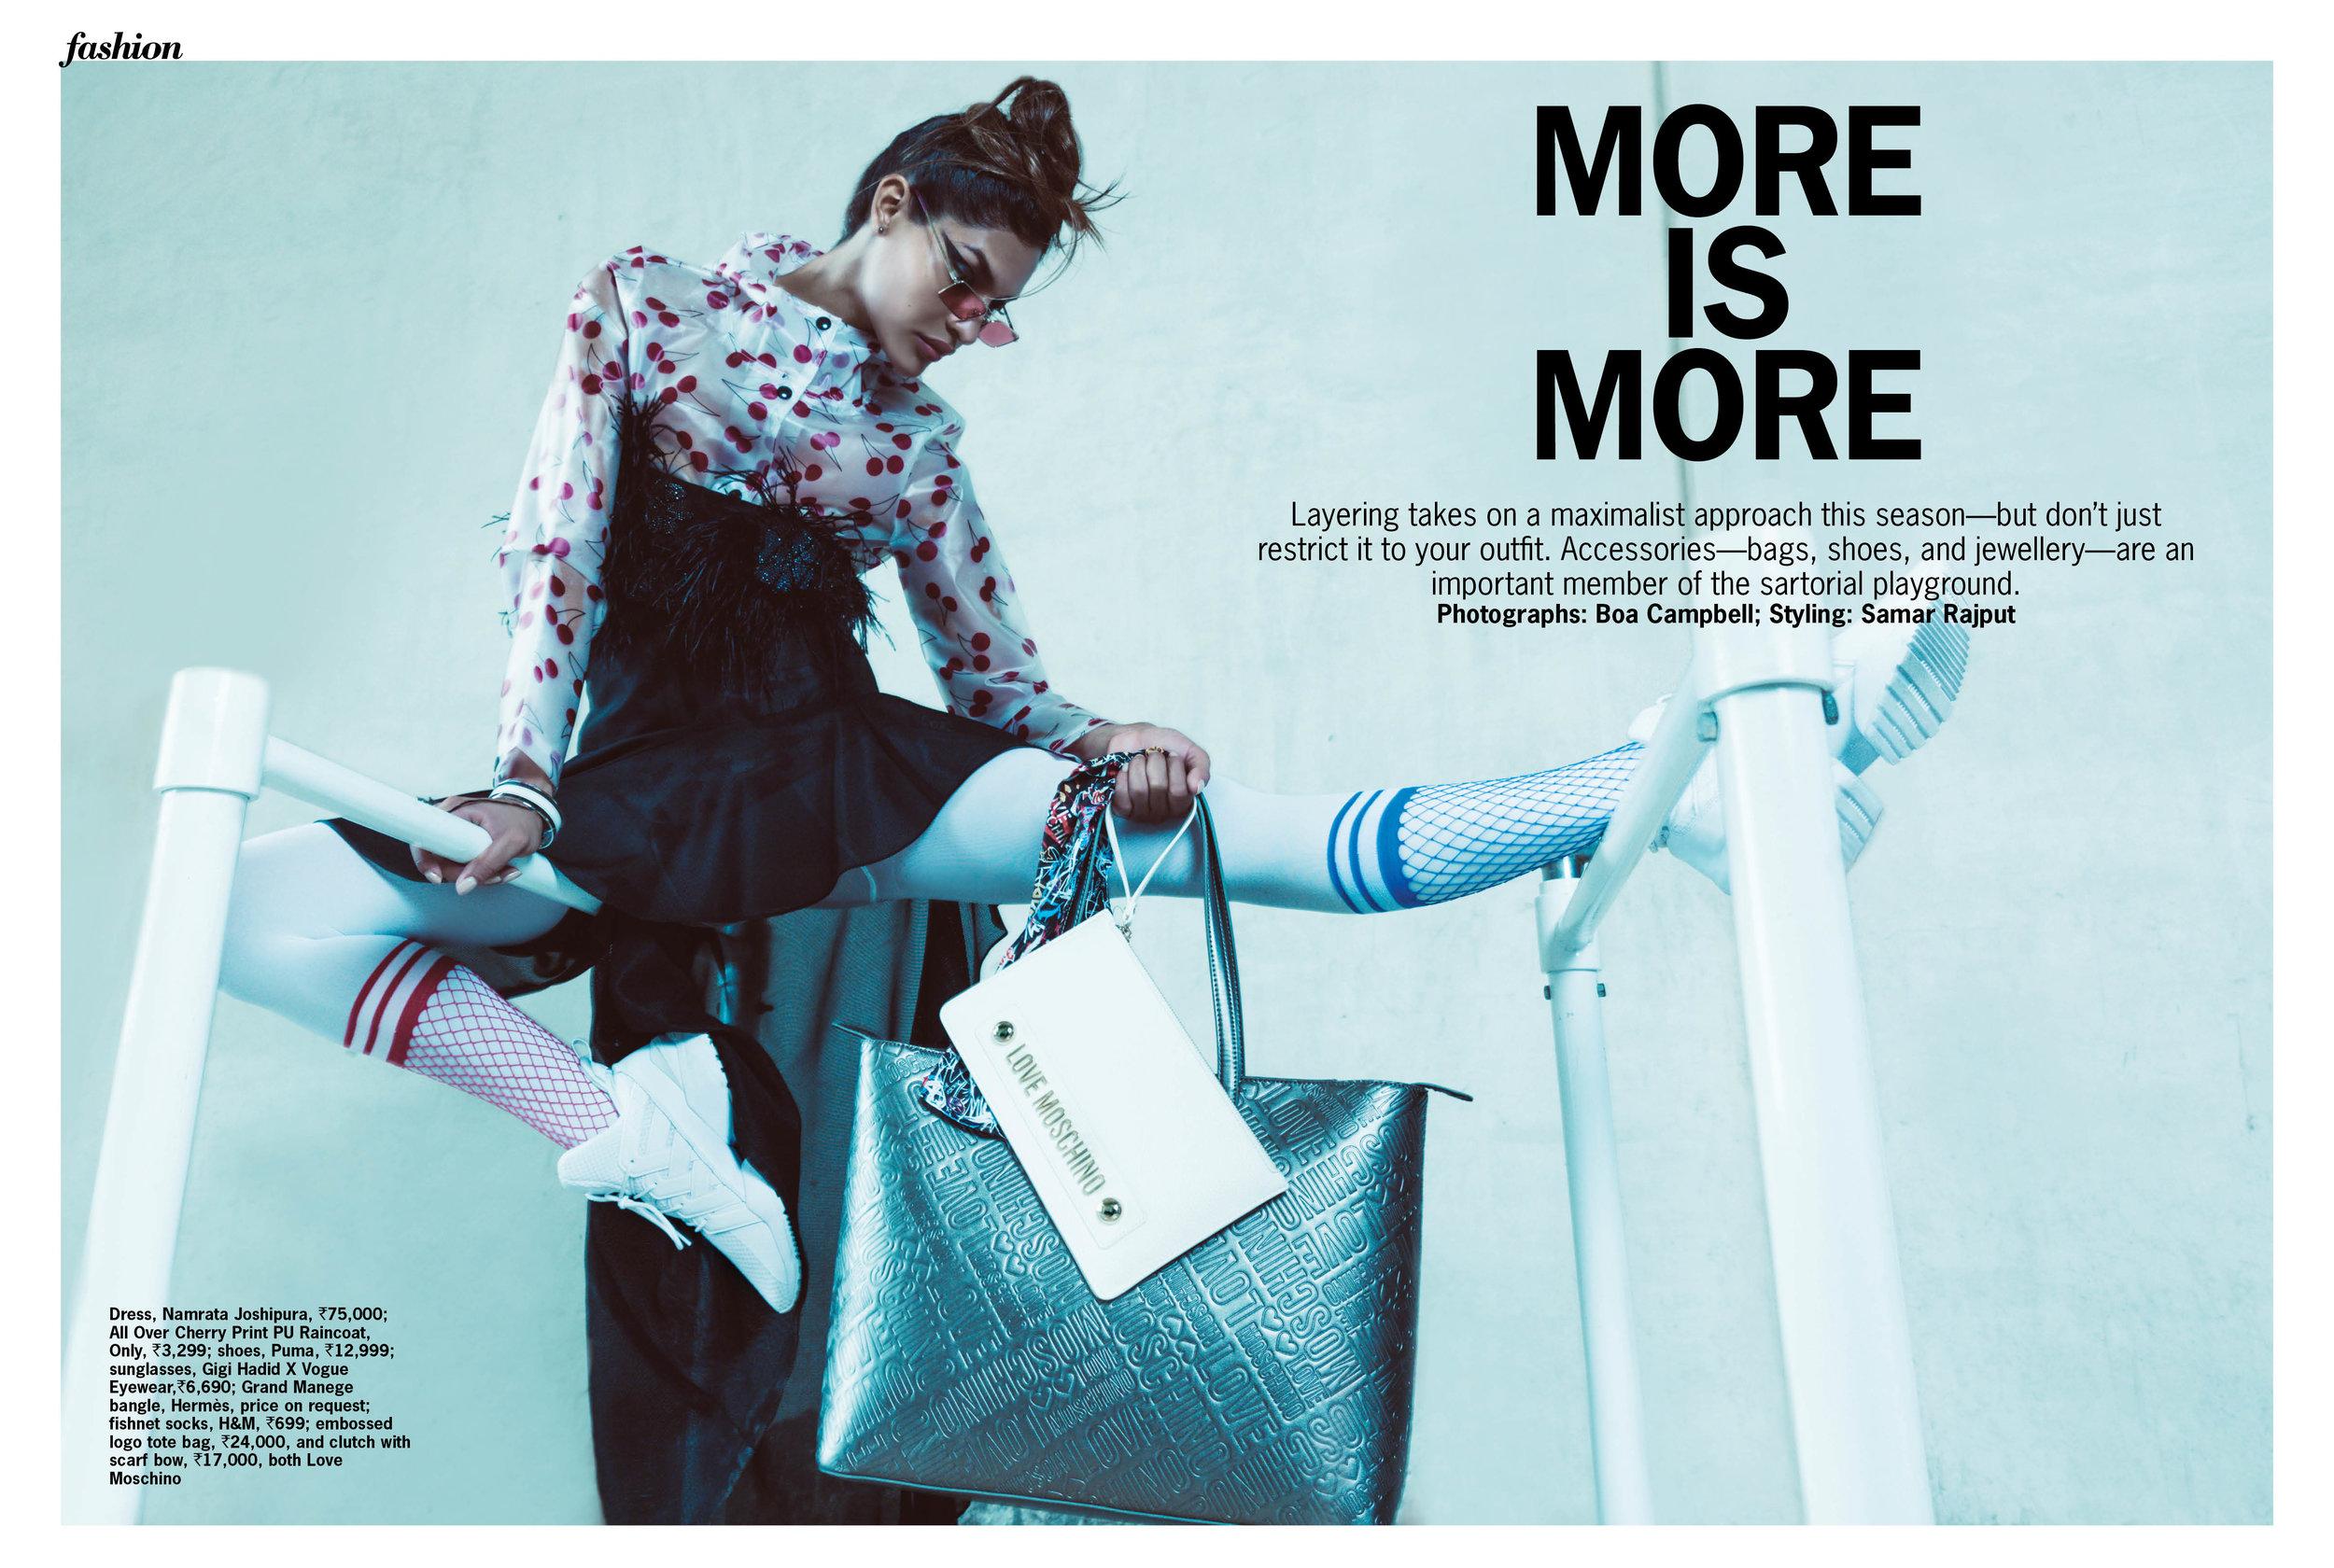 L Officiel Interiors Gigi fashion photographer, tokyo, japan // boa campbell — boa